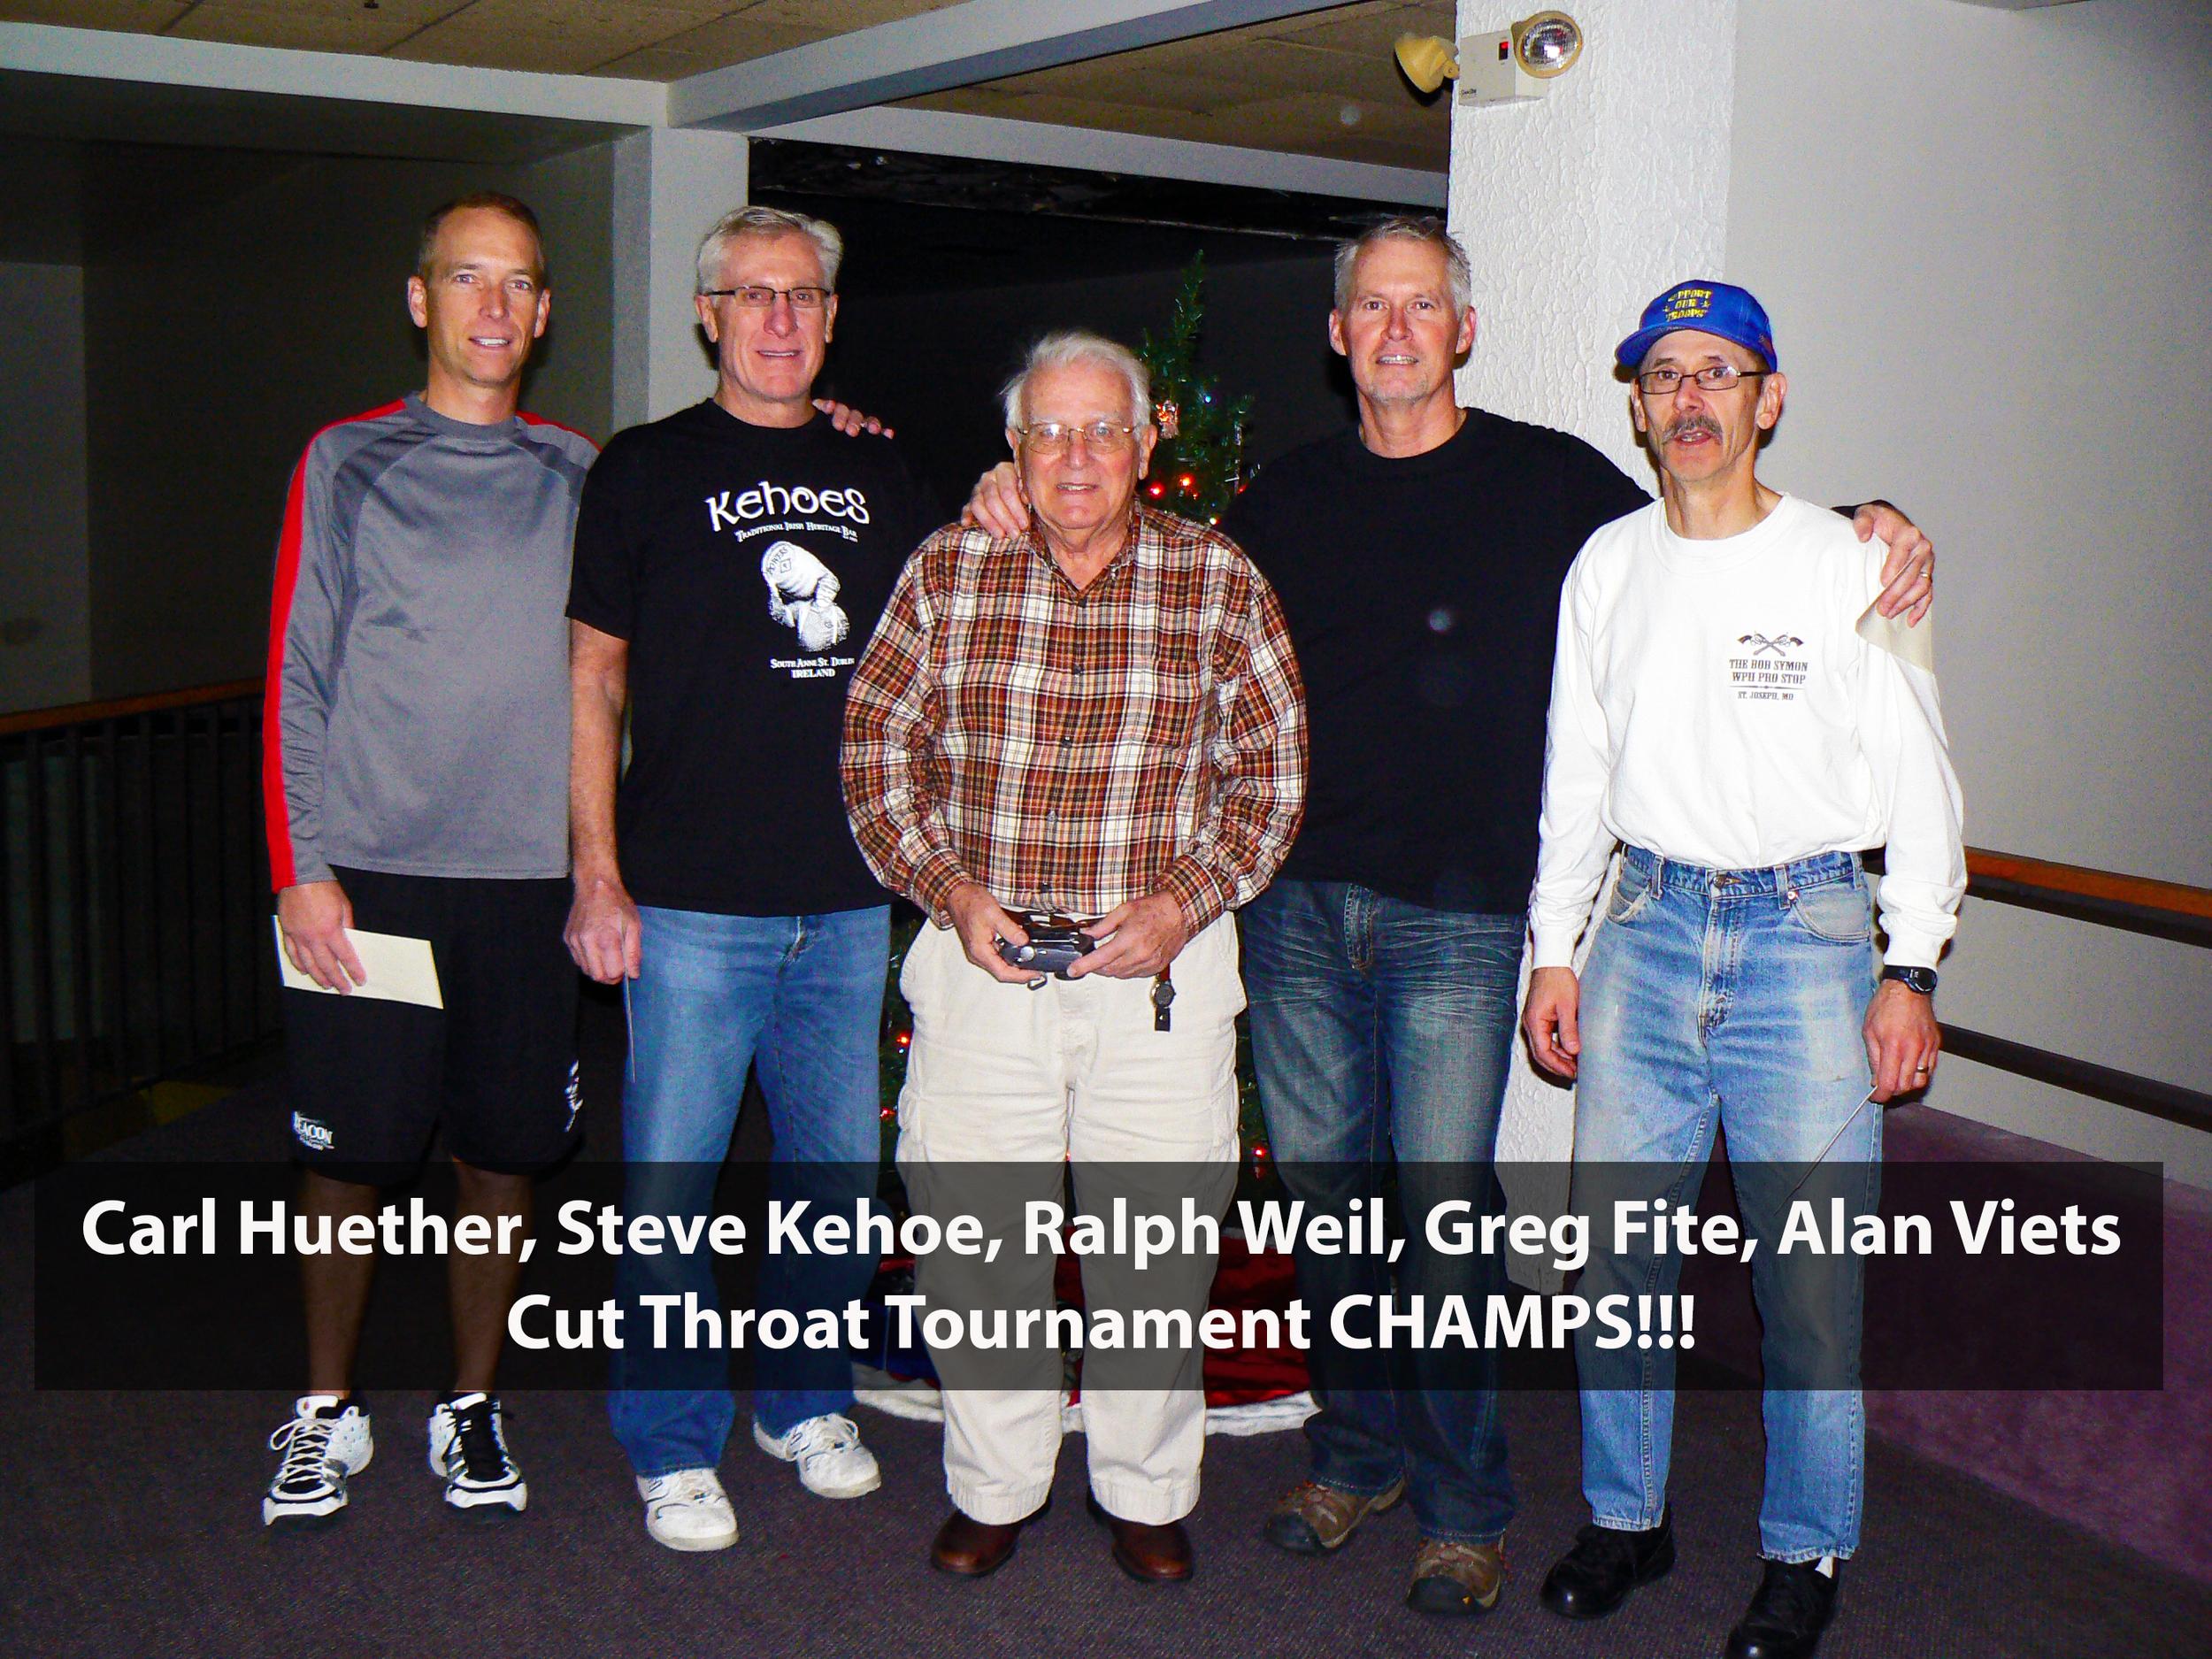 Carl Huether, Steve Kehoe, Ralph Weil, Greg Fite, Alan Viets Cutthroat champs.png